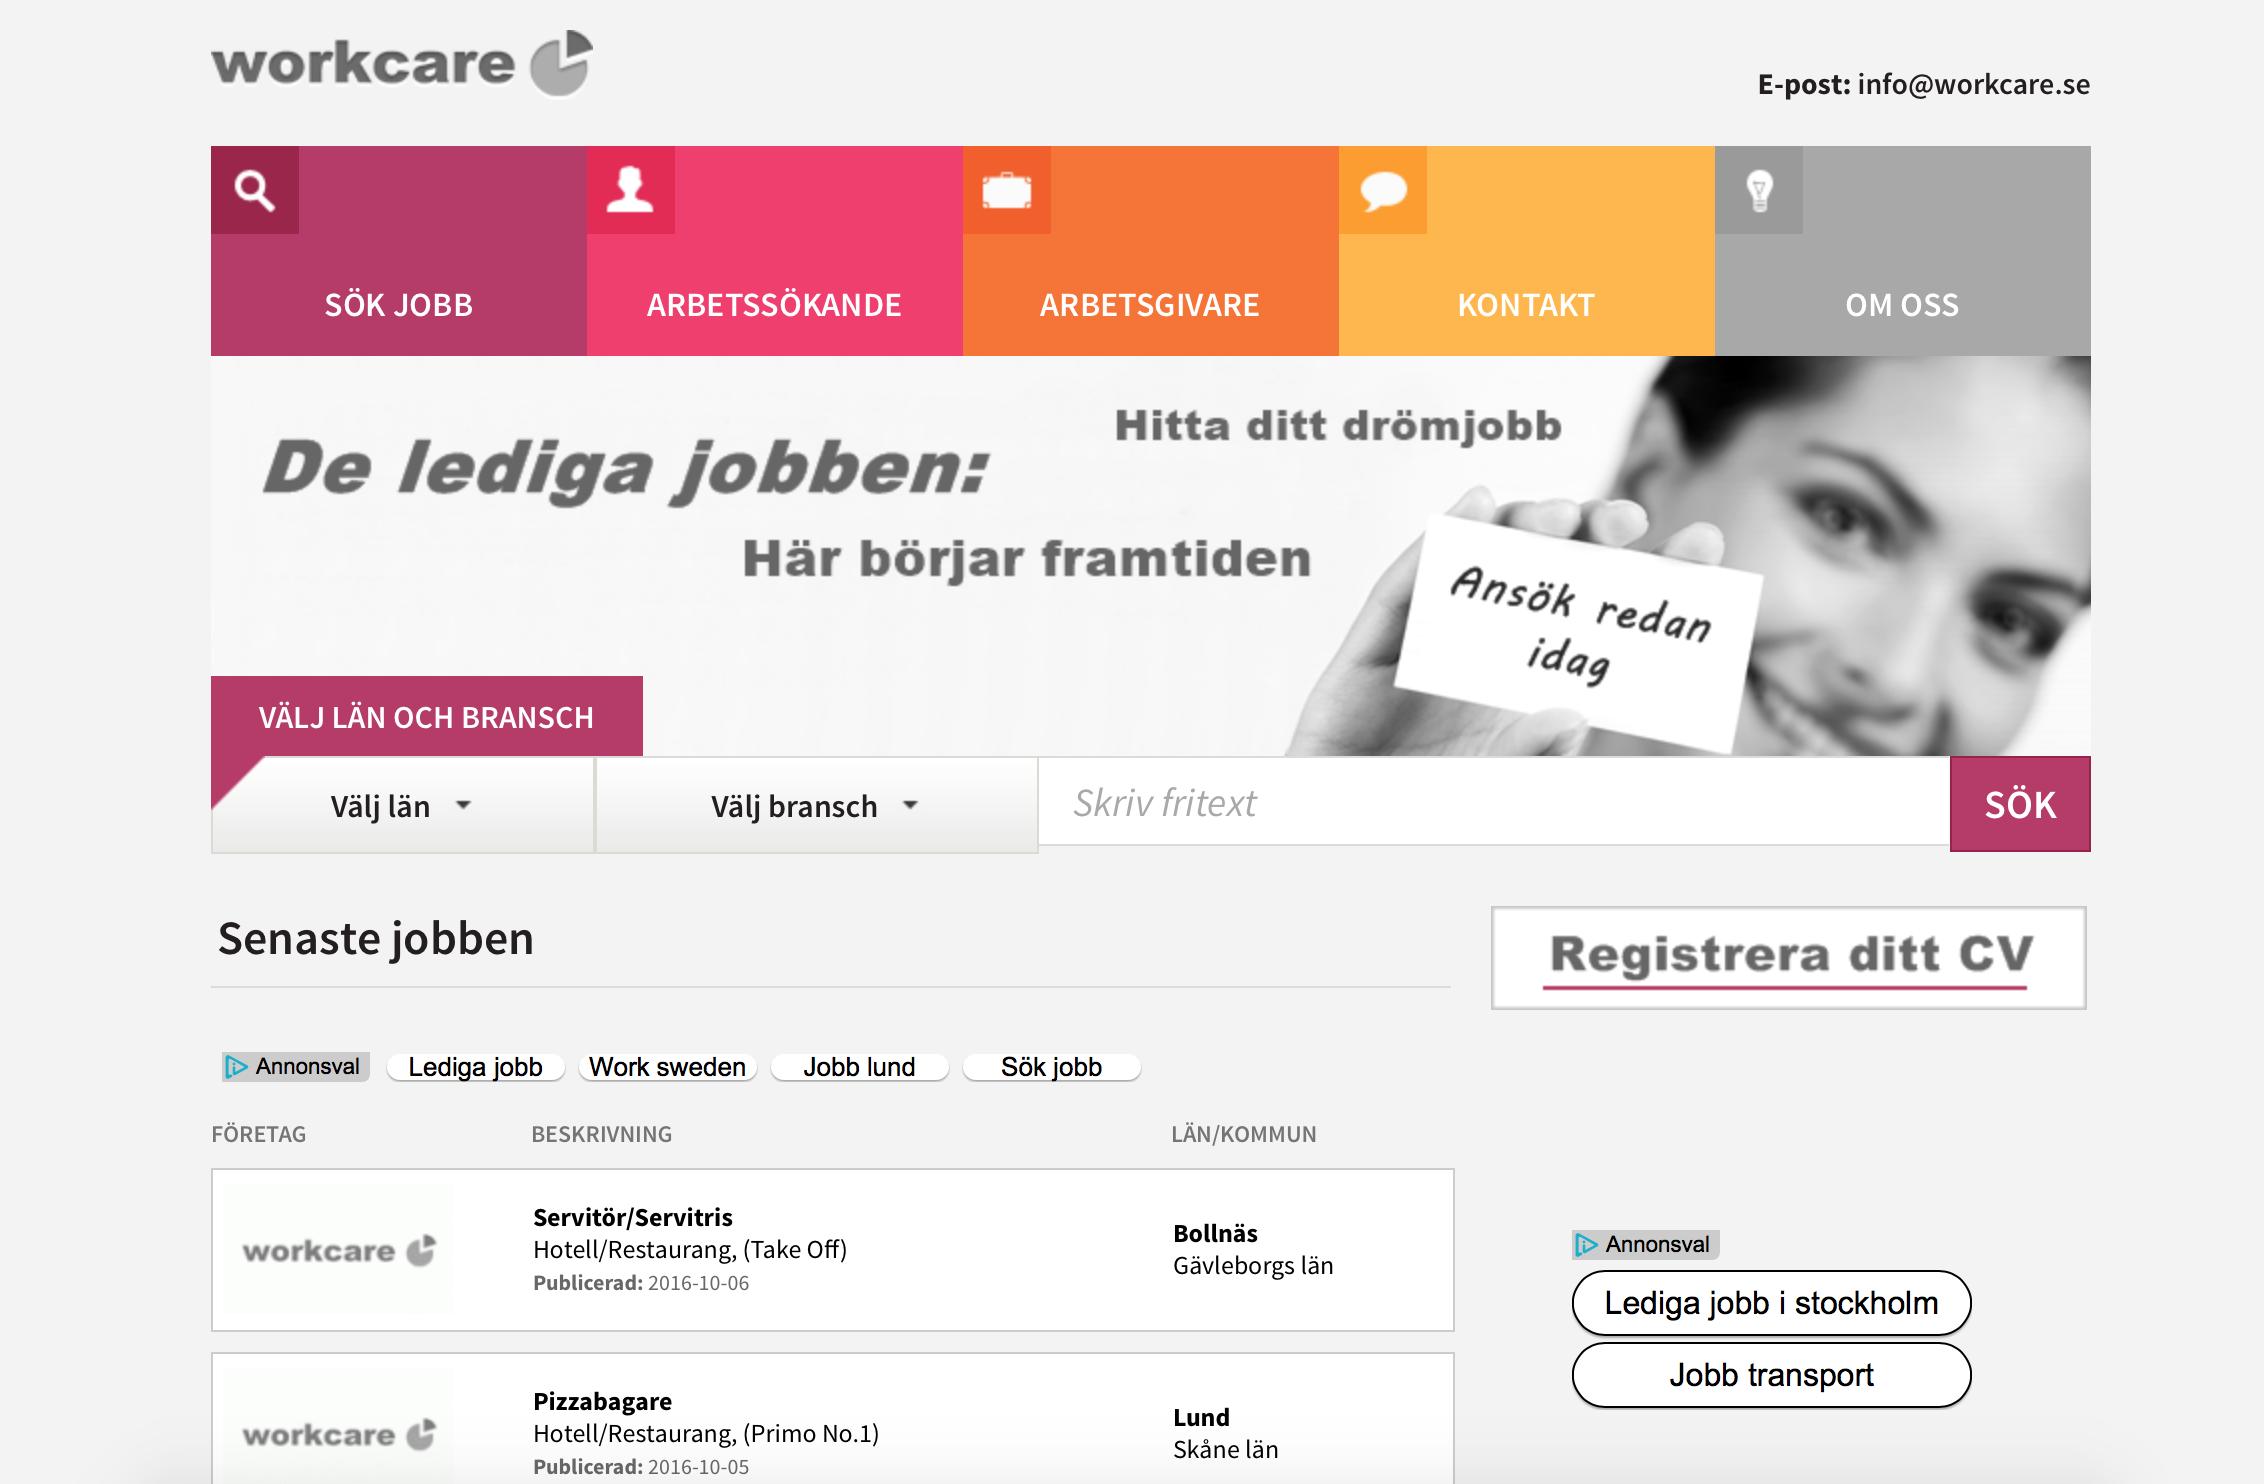 Workcare Sverige – oroväckande kopplingar